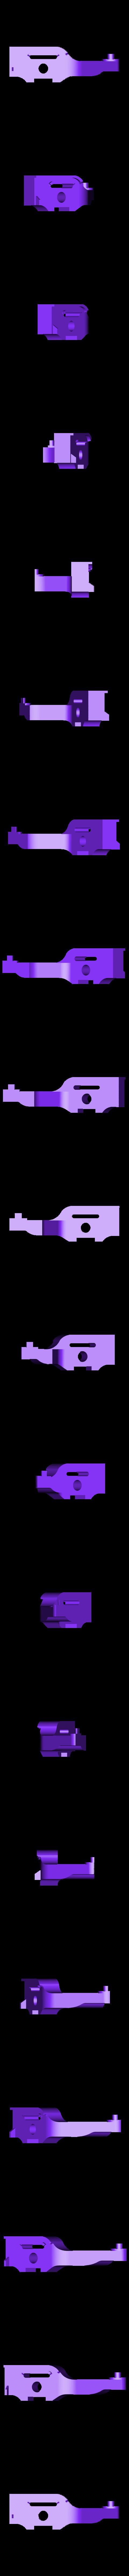 Trailing_Truck_Frame-3.STL Download free STL file 4-8-8-4 Big Boy Locomotive • 3D printer object, RaymondDeLuca